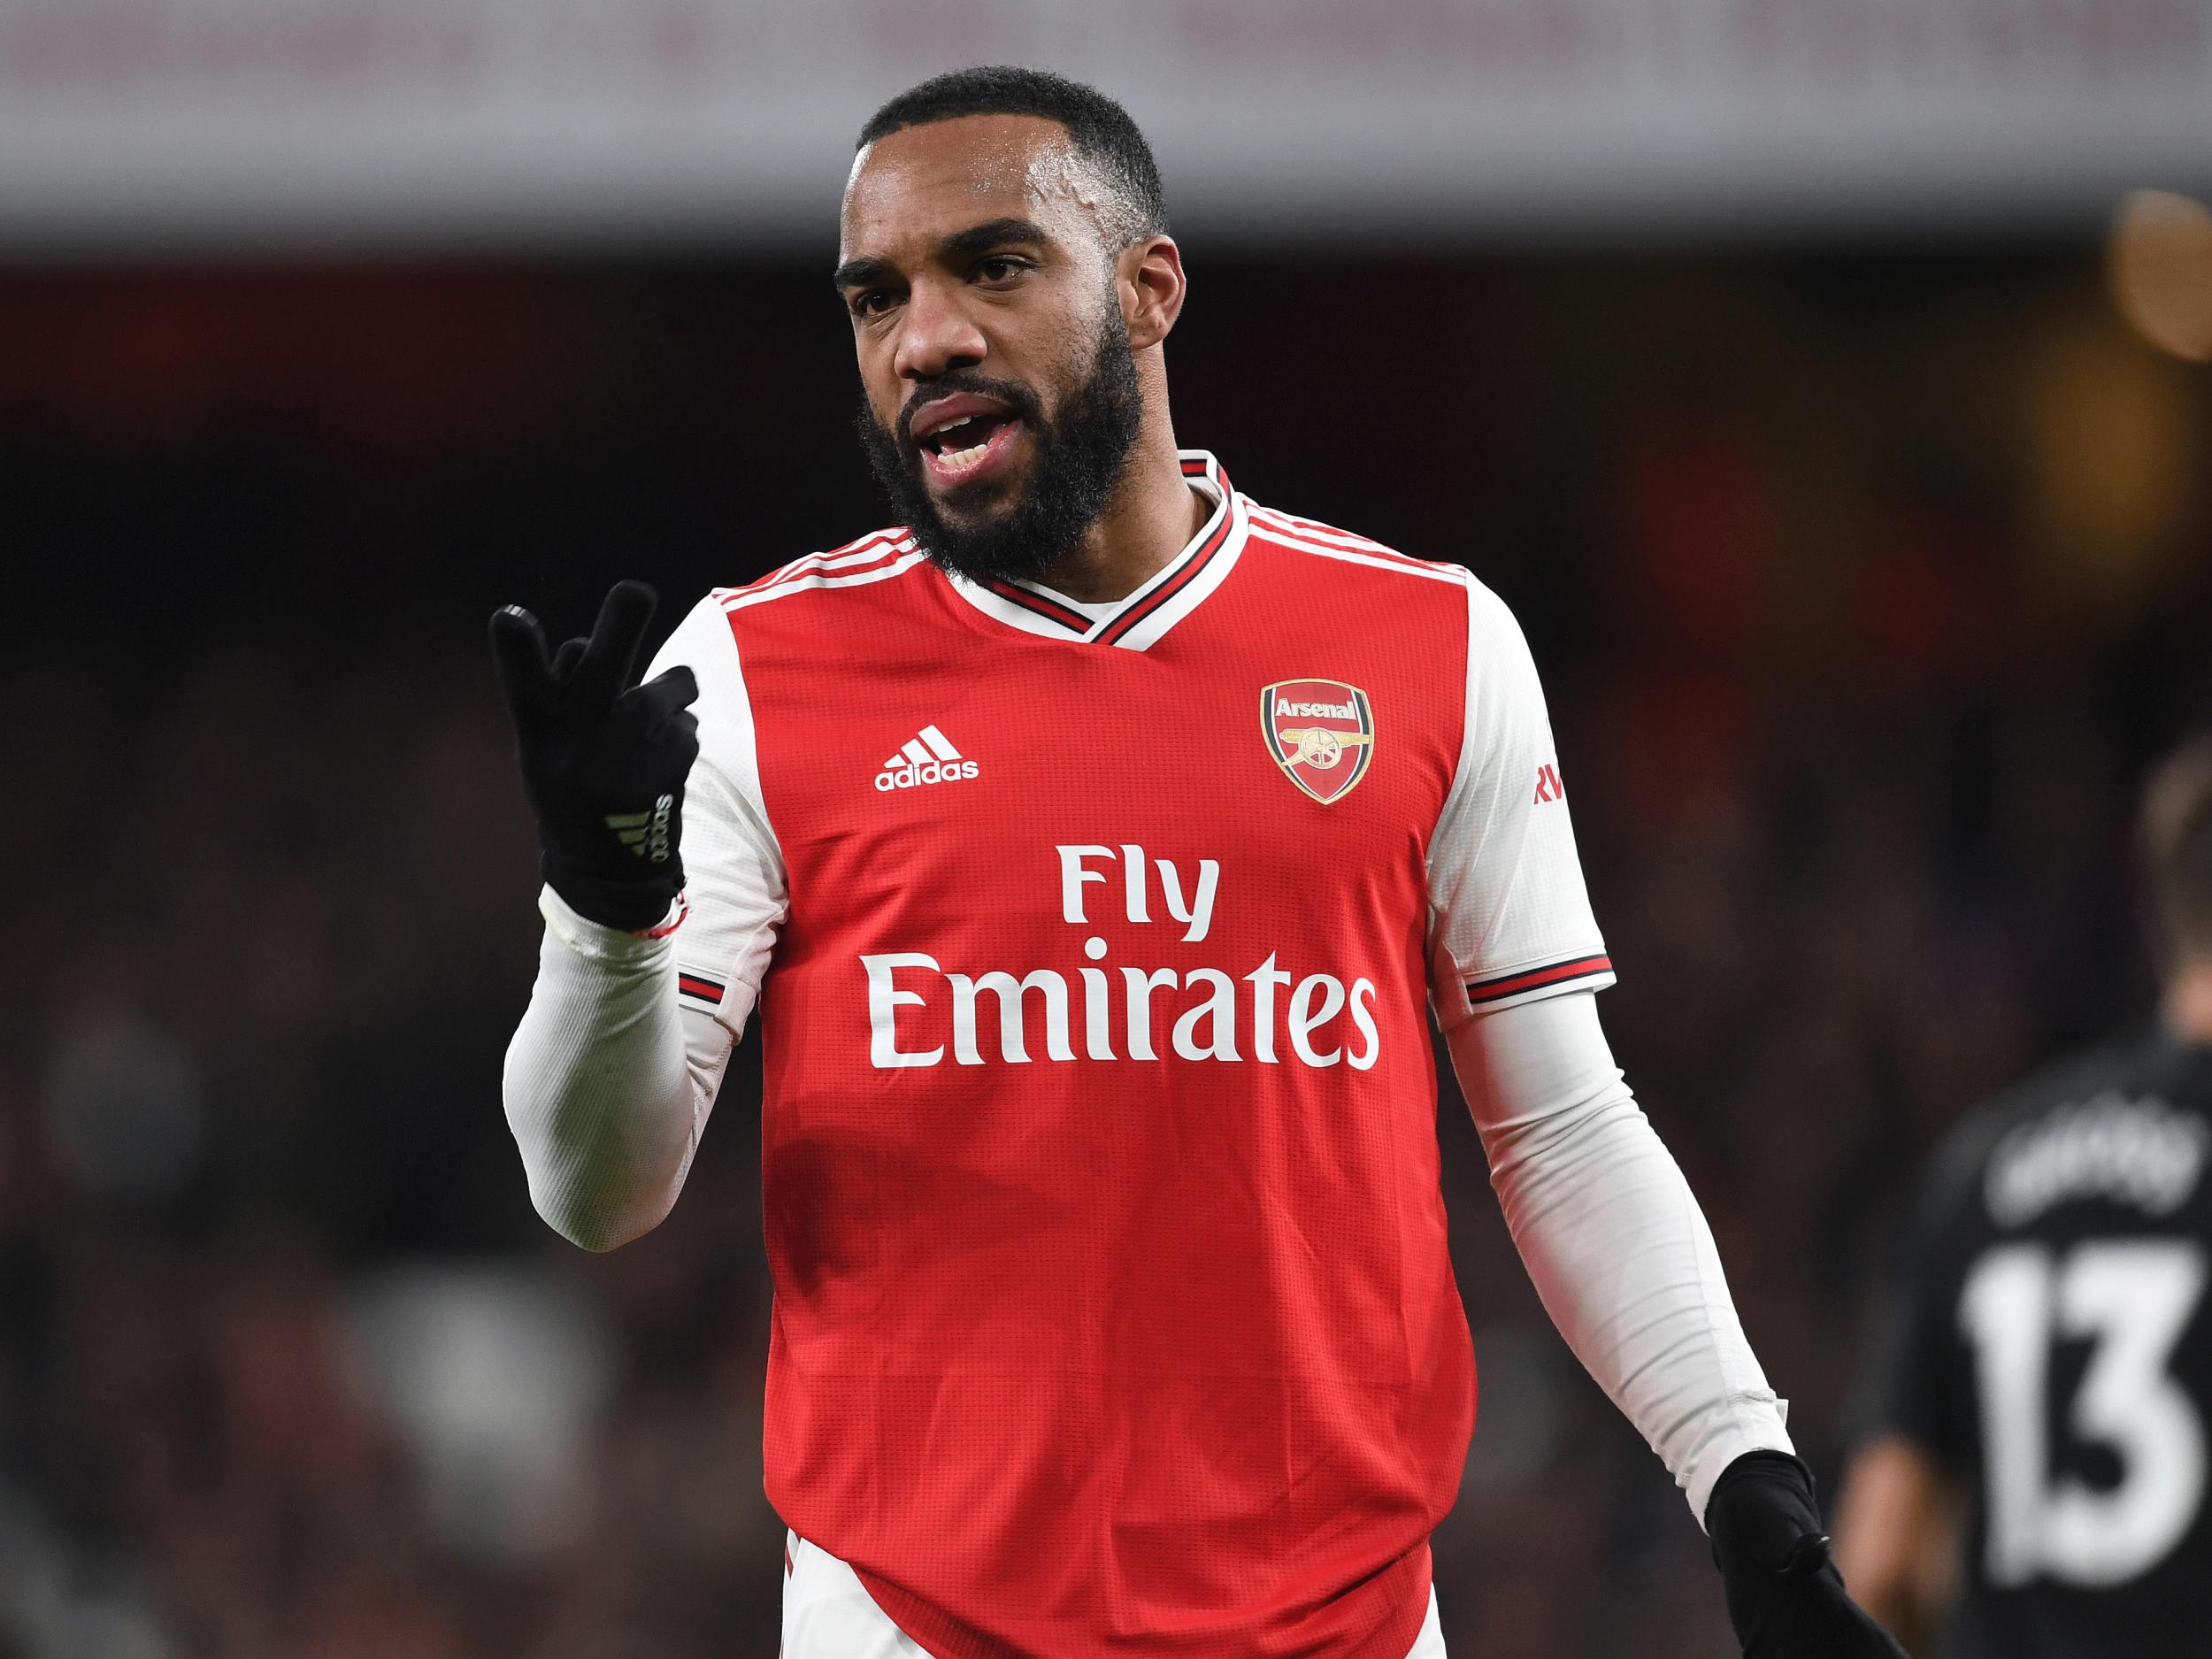 Lacazette đá chính, Arsenal hòa 4 thua 1/ 7 trận - Bóng Đá